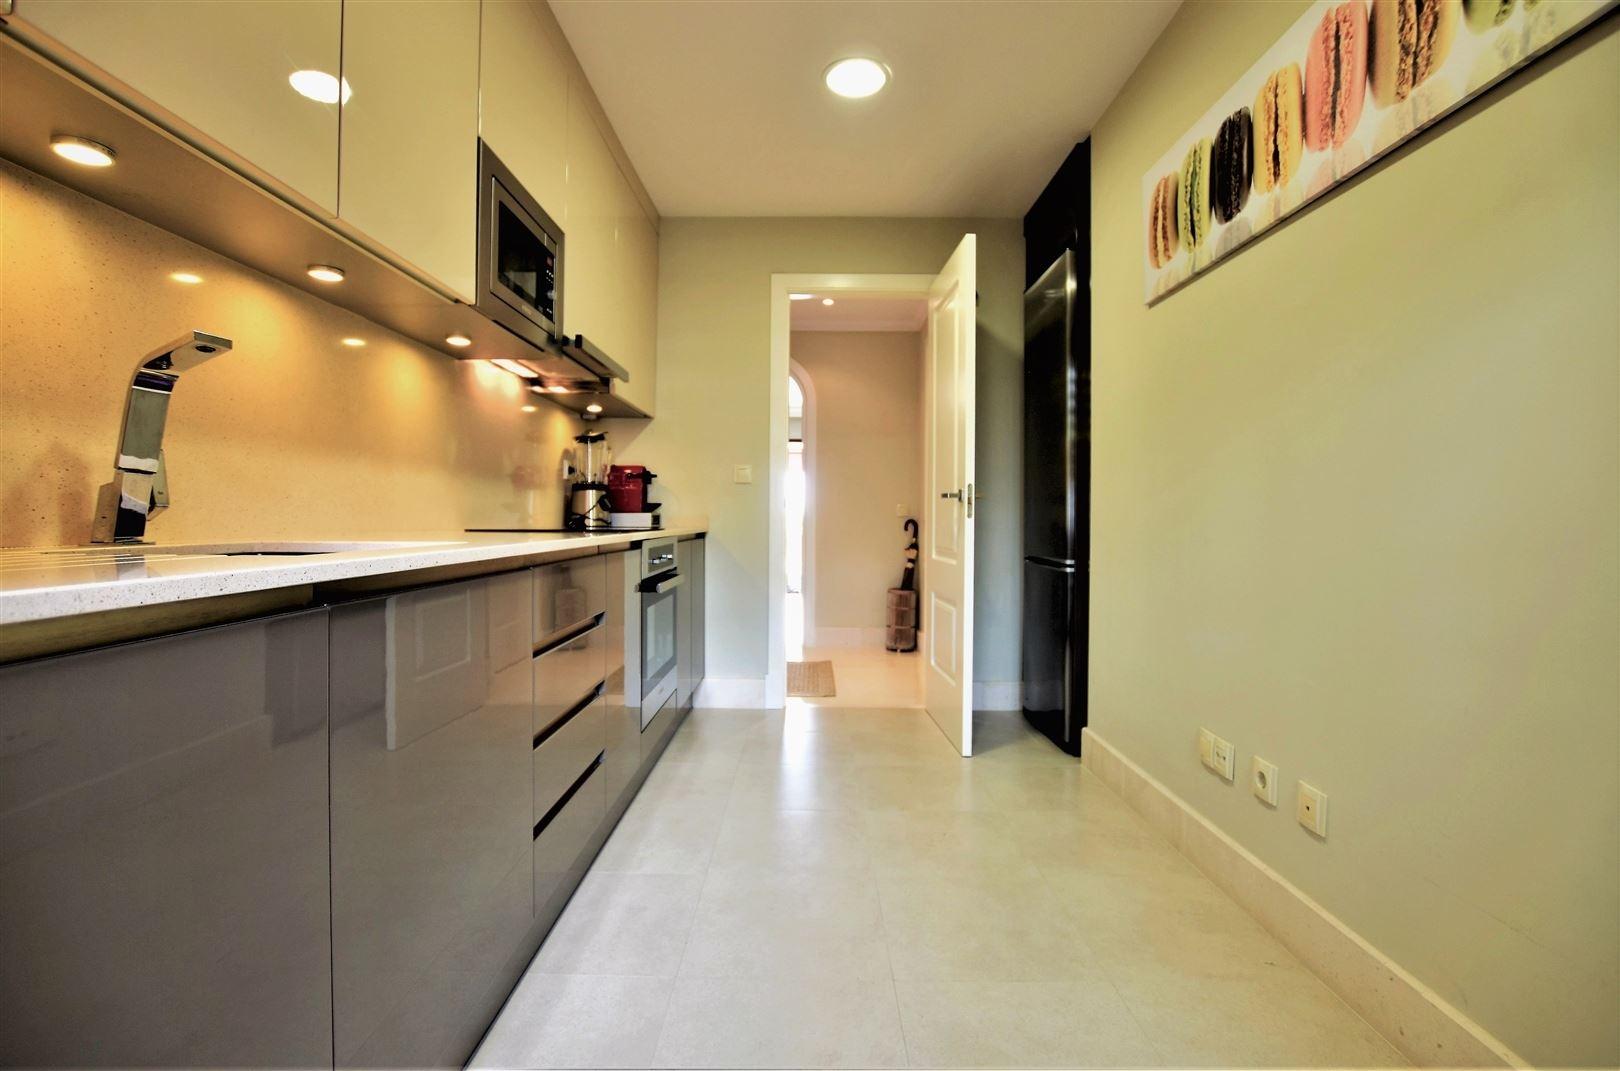 Foto 15 : Appartement te 29679 MARBELLA (Spanje) - Prijs € 1.750